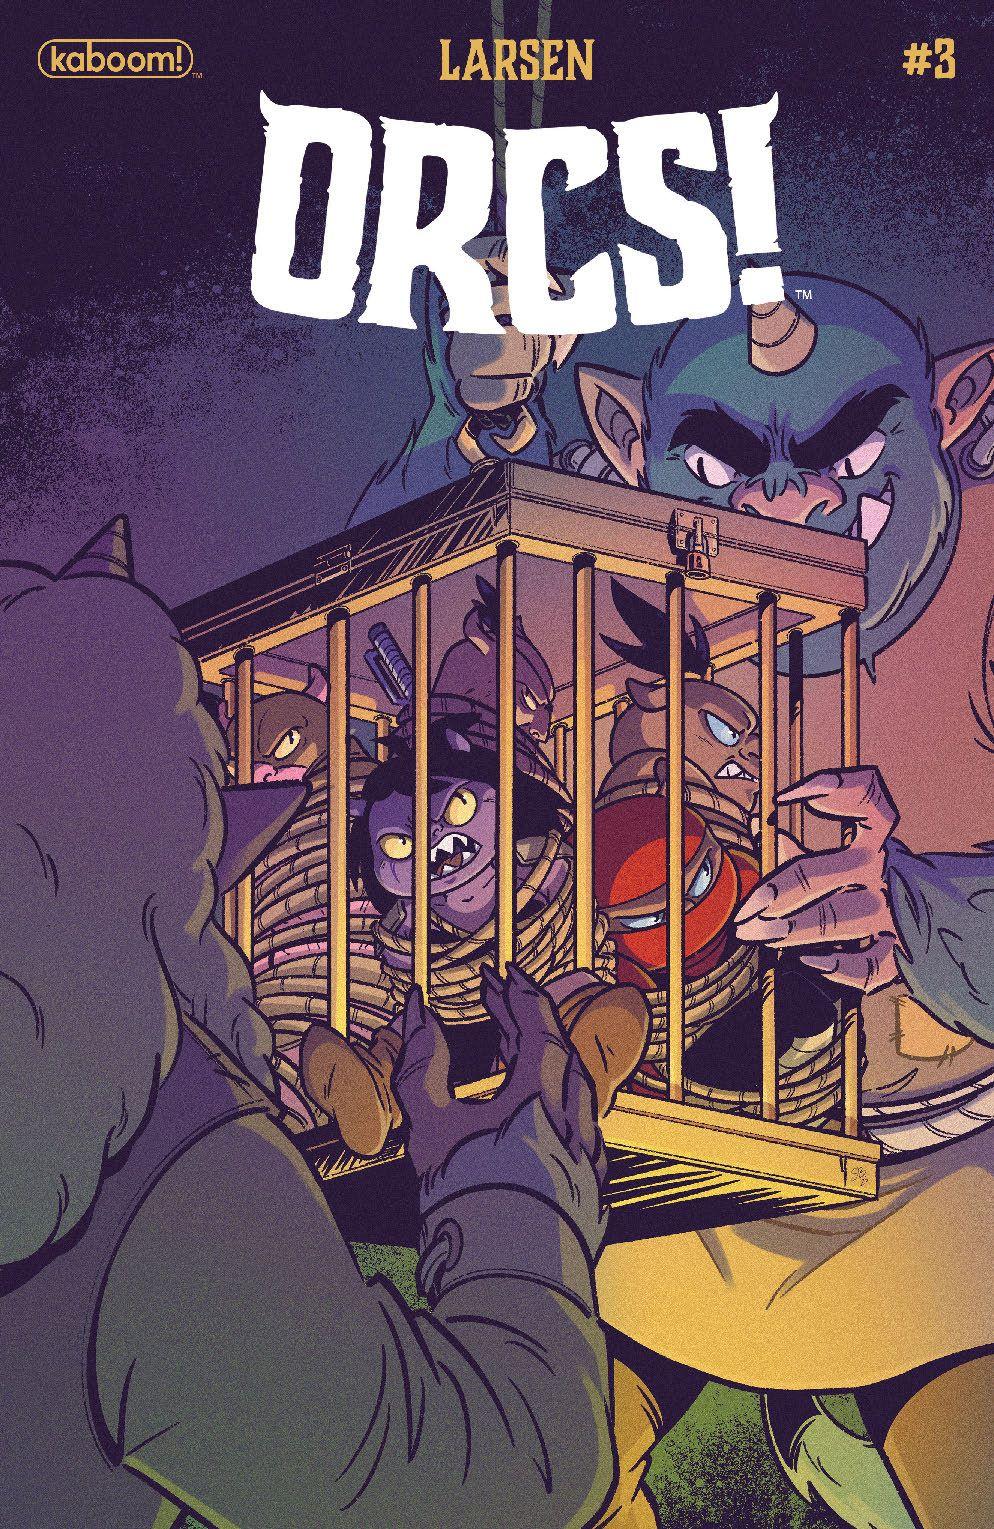 Orcs_003_Cover_B_Variant ComicList Previews: ORCS #3 (OF 5)